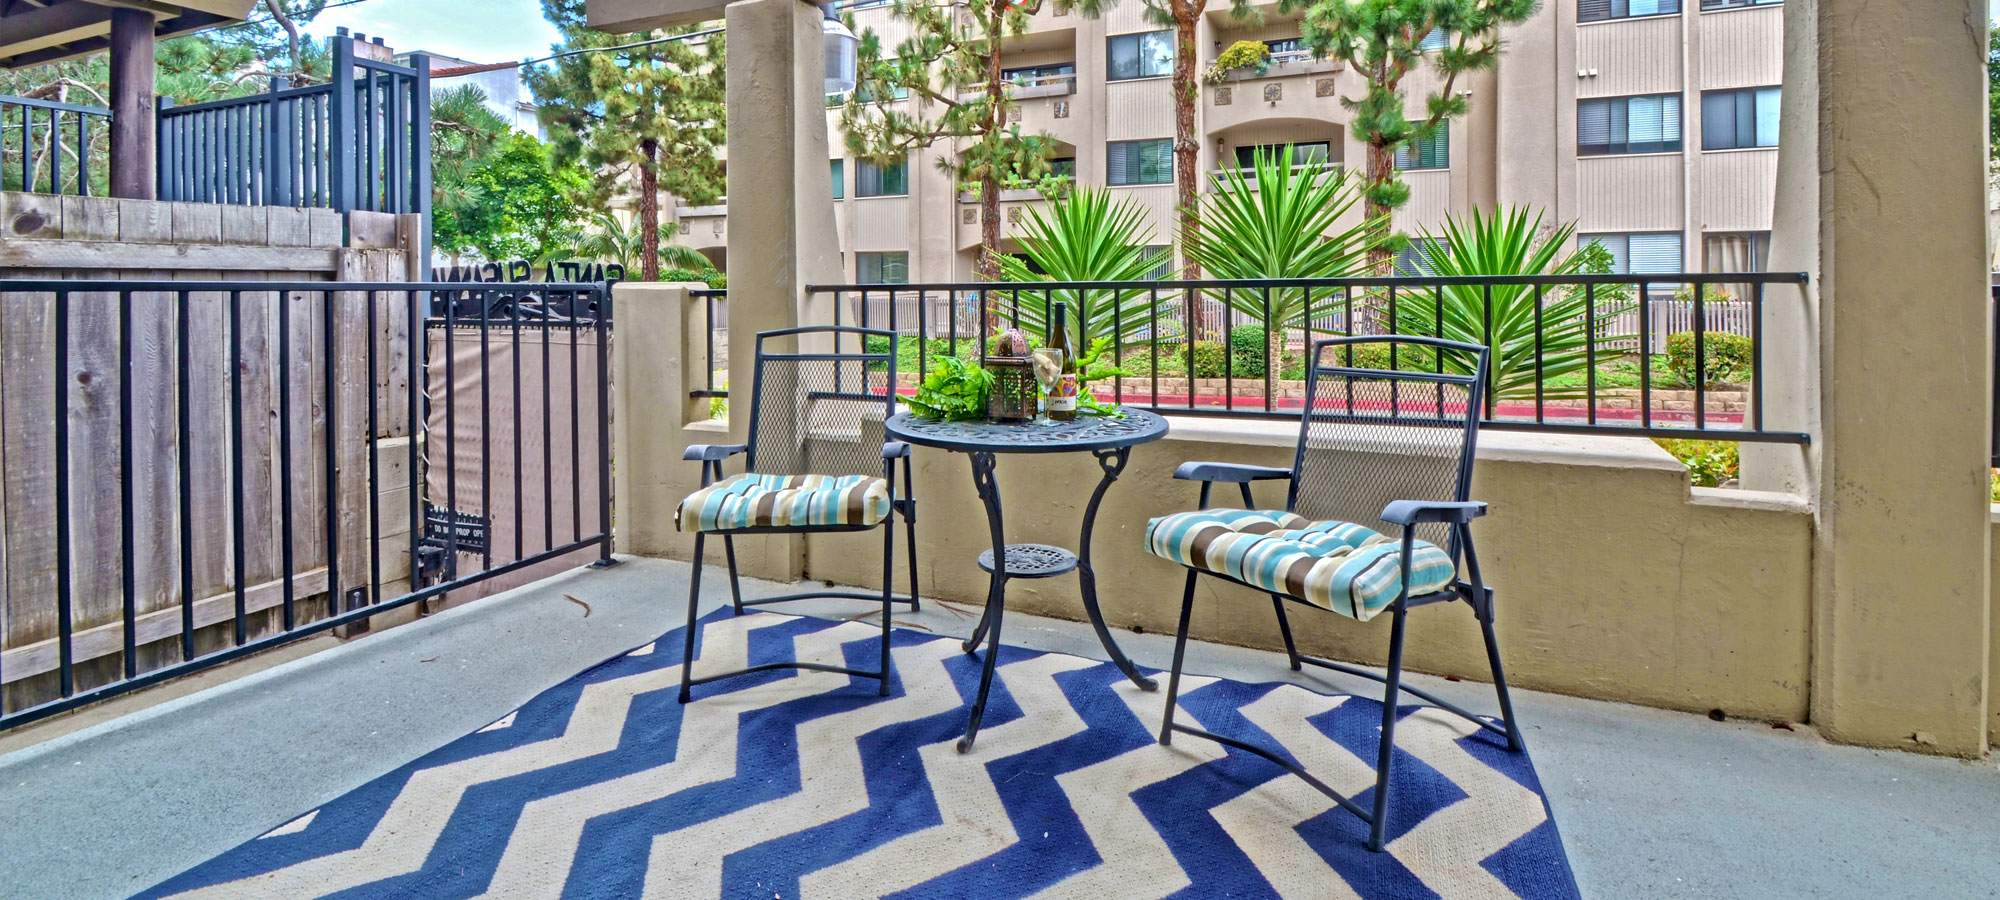 1235 Parker Pl. San Diego, CA 92109